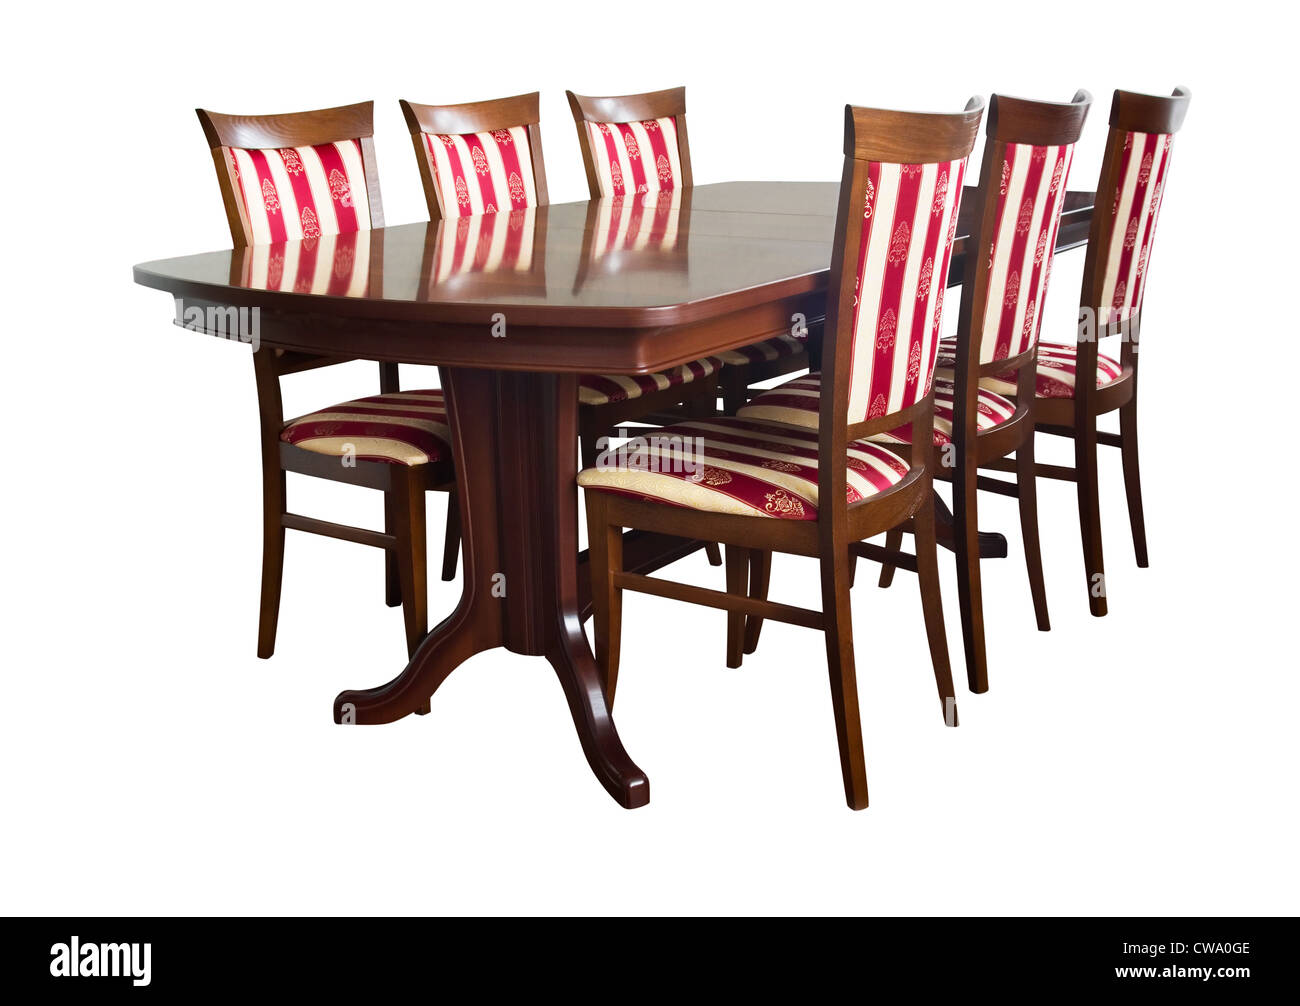 Kitchen Table Stockfotos & Kitchen Table Bilder - Alamy